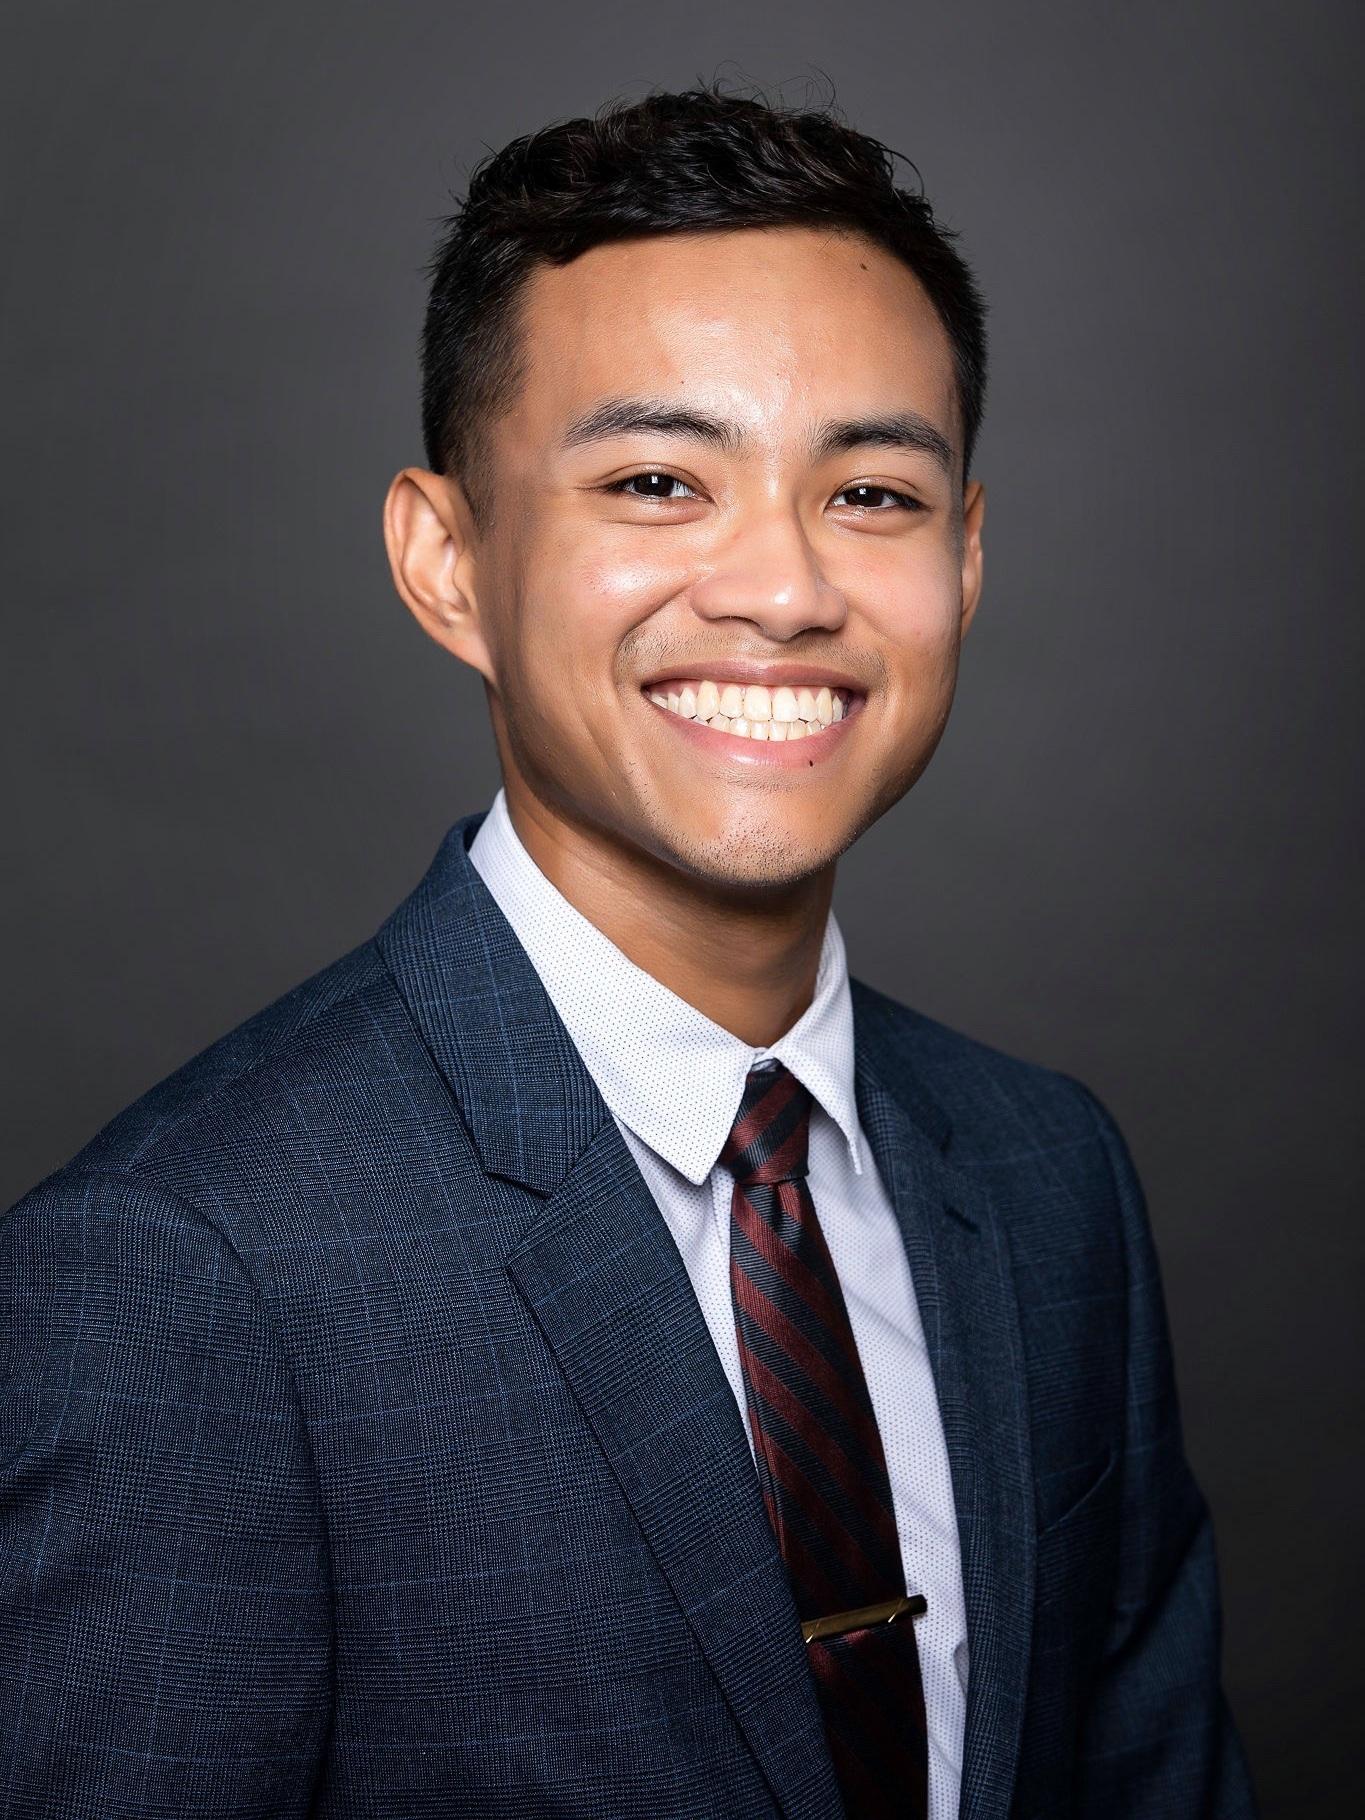 John Carlo Luna, BA - Business Insights Consultant, South Bay (Torrance)